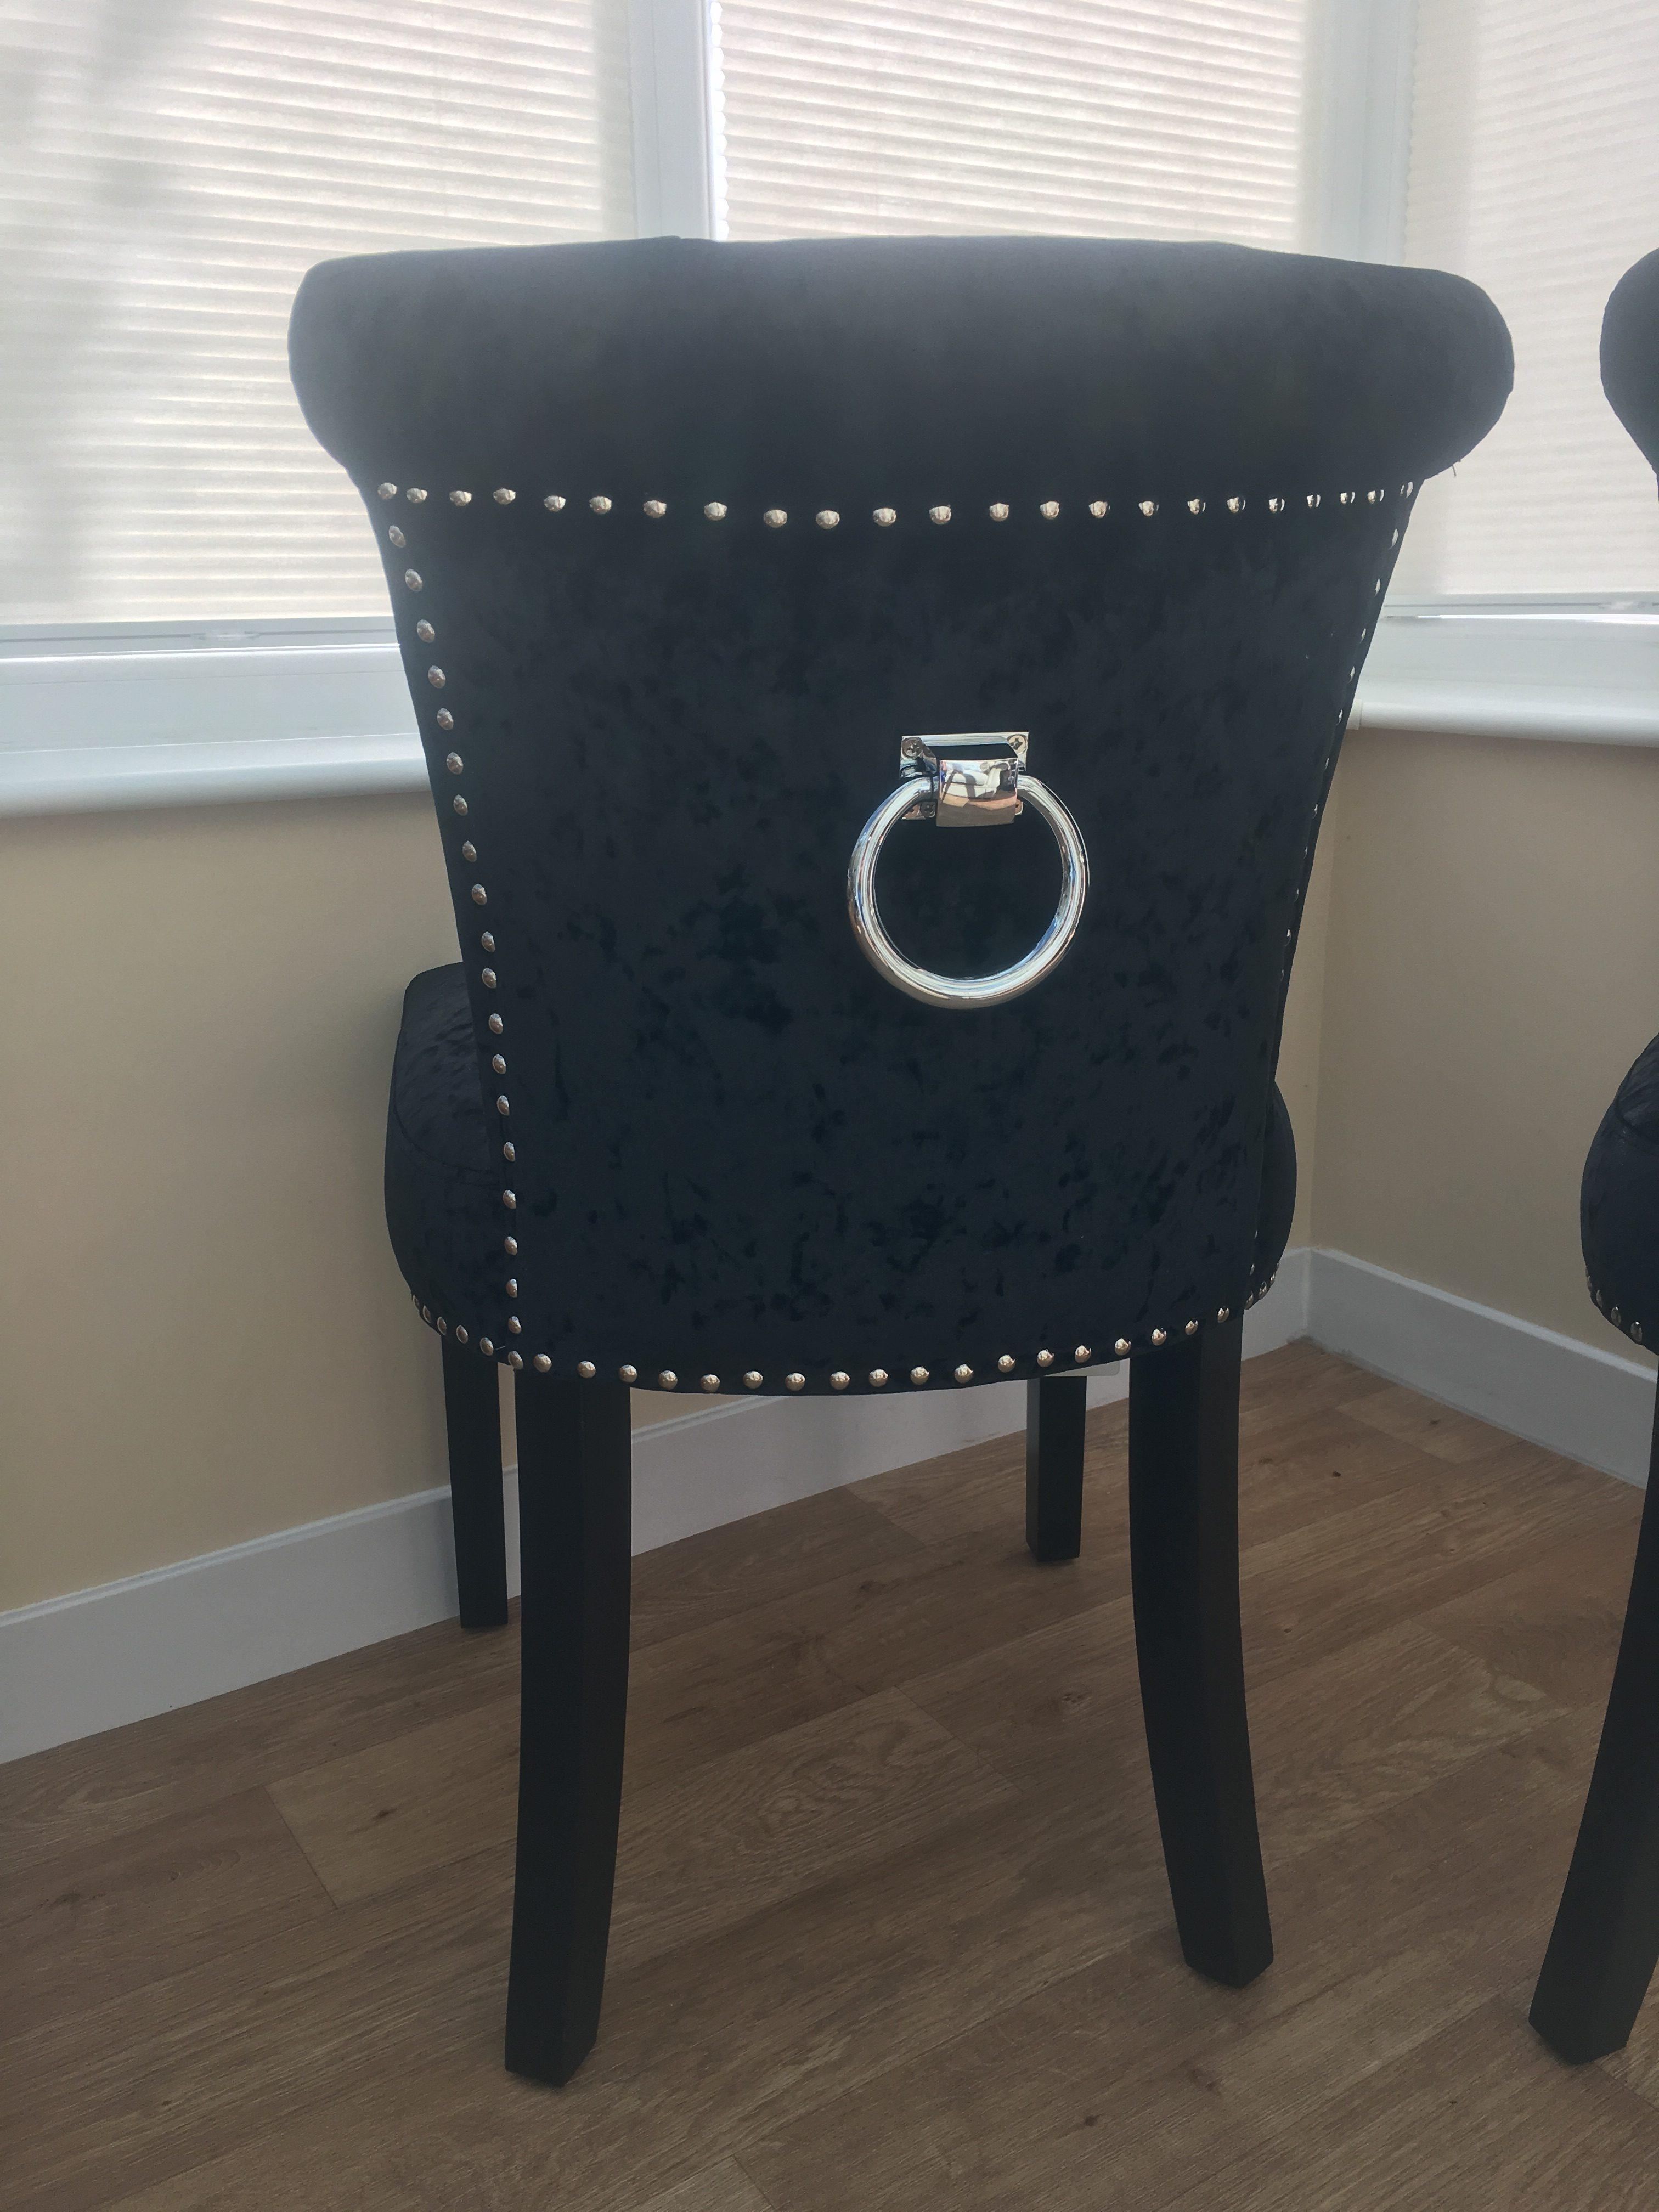 Regal Glam Crushed Velvet Black Upholstered Dining Or